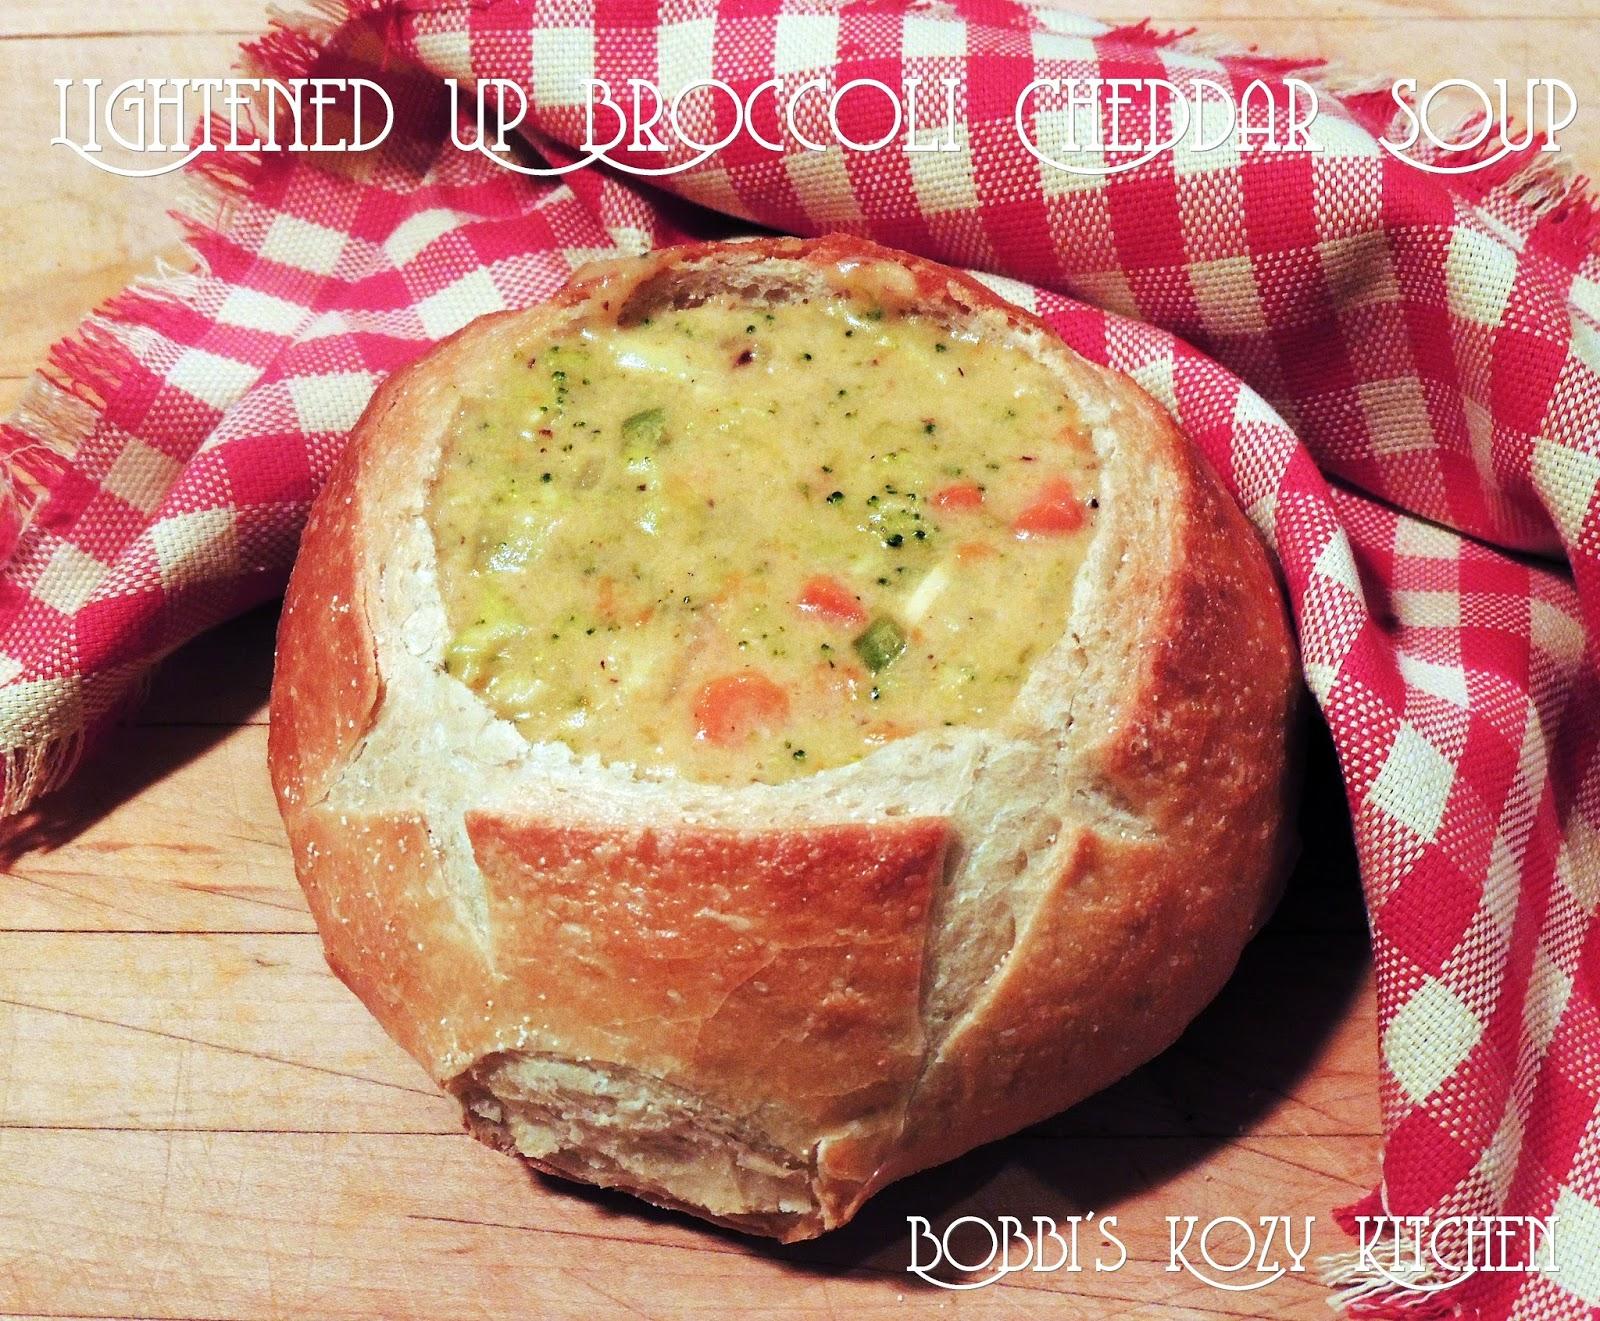 lightened up panera inspired broccoli cheddar soup bobbi s kozy